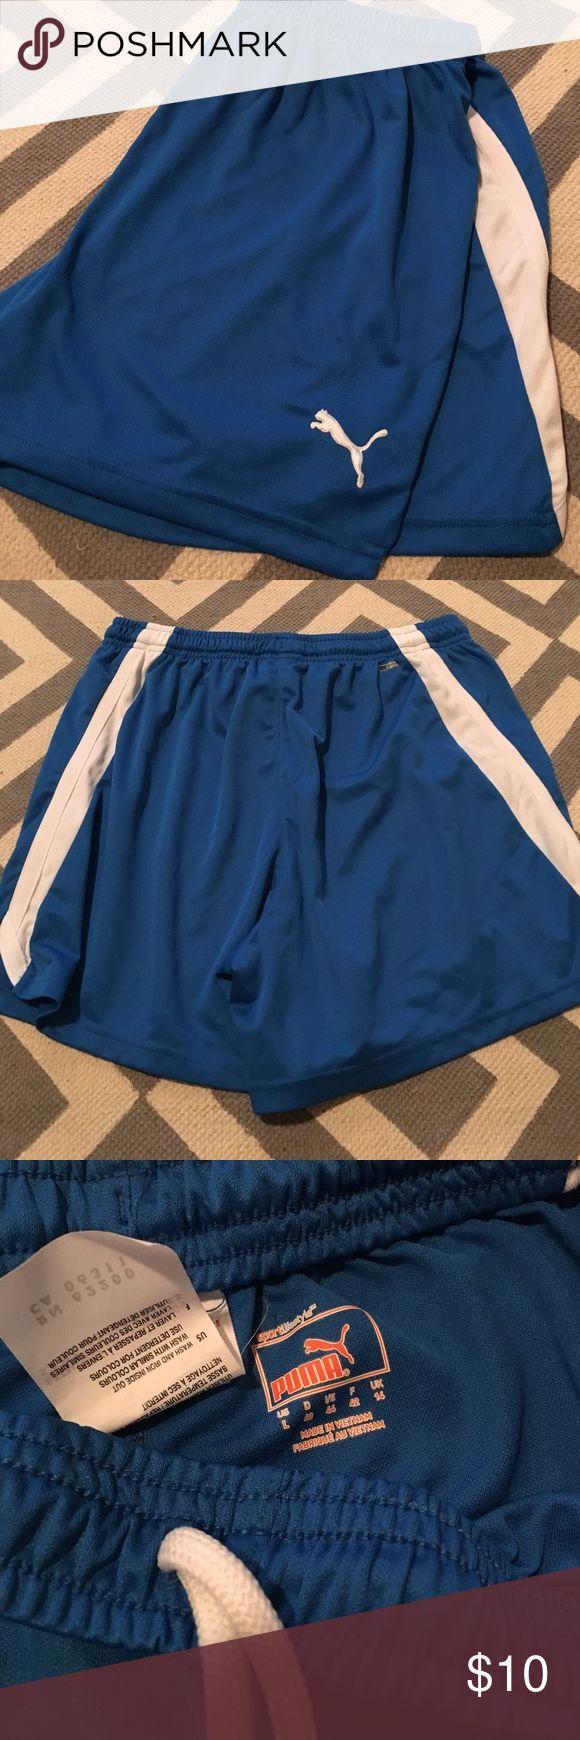 Royal blue puma athletic shorts Royal blue shorts with white stripe down leg.  100% polyester. Drawstring. Puma Shorts